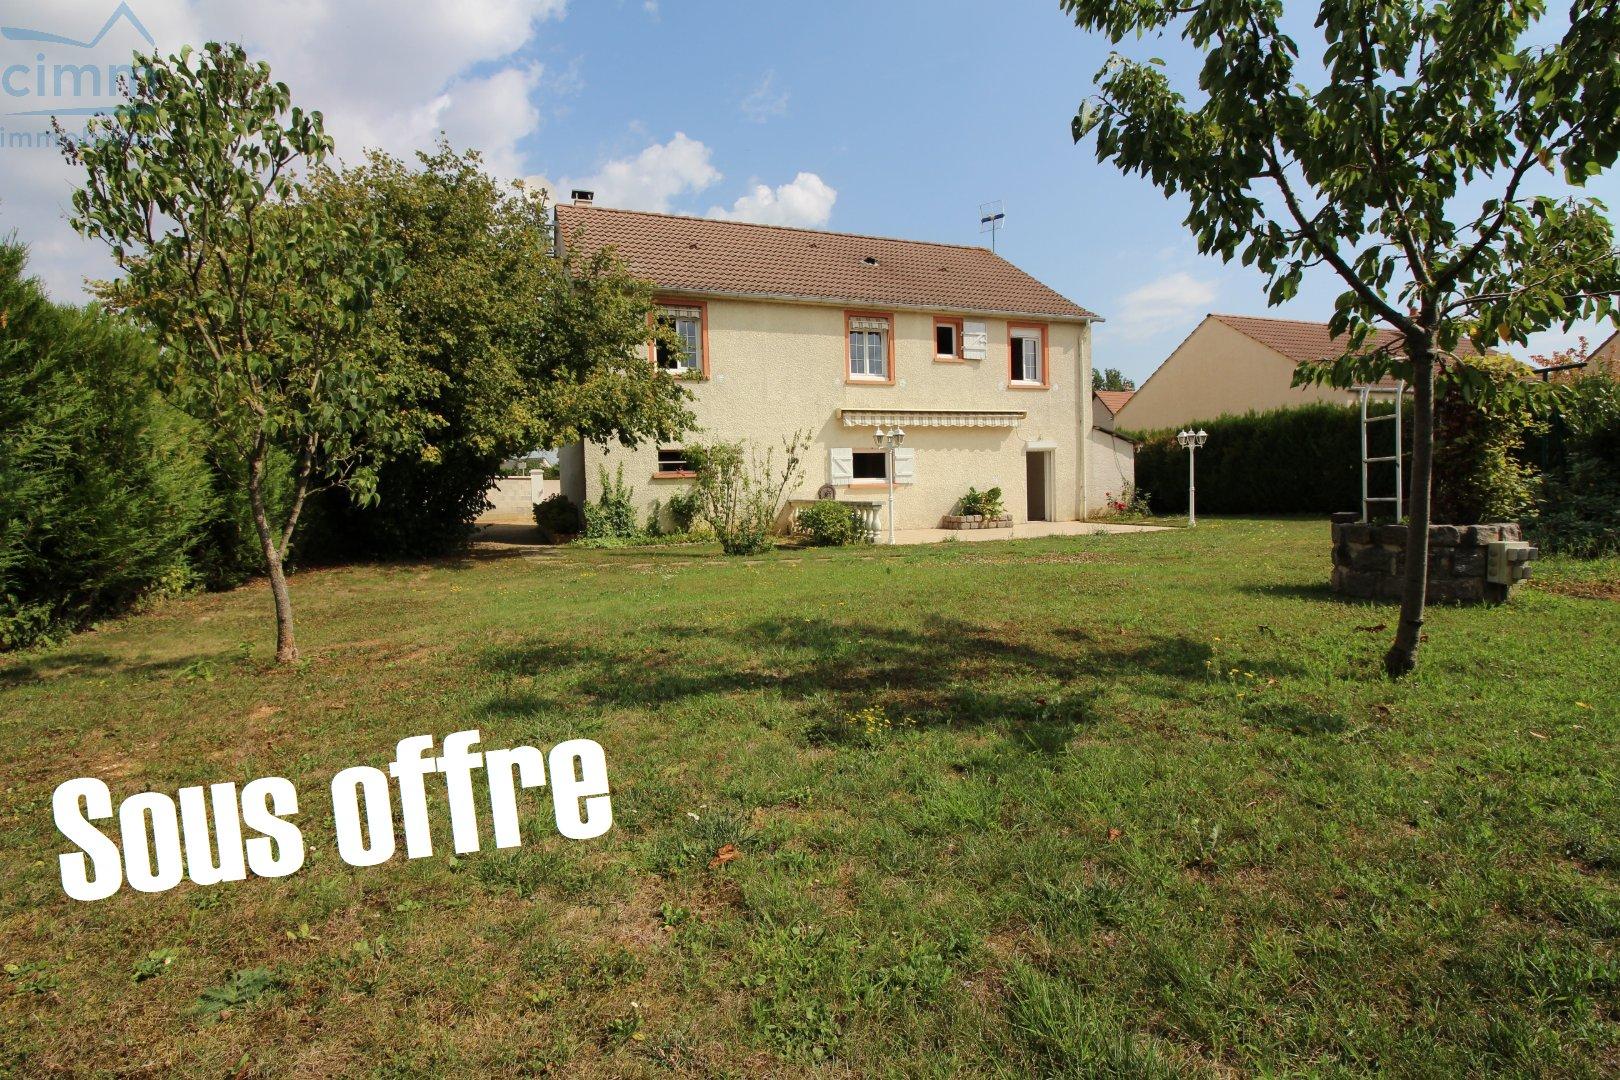 vente maison/villa 5 pièces GENLIS 21110